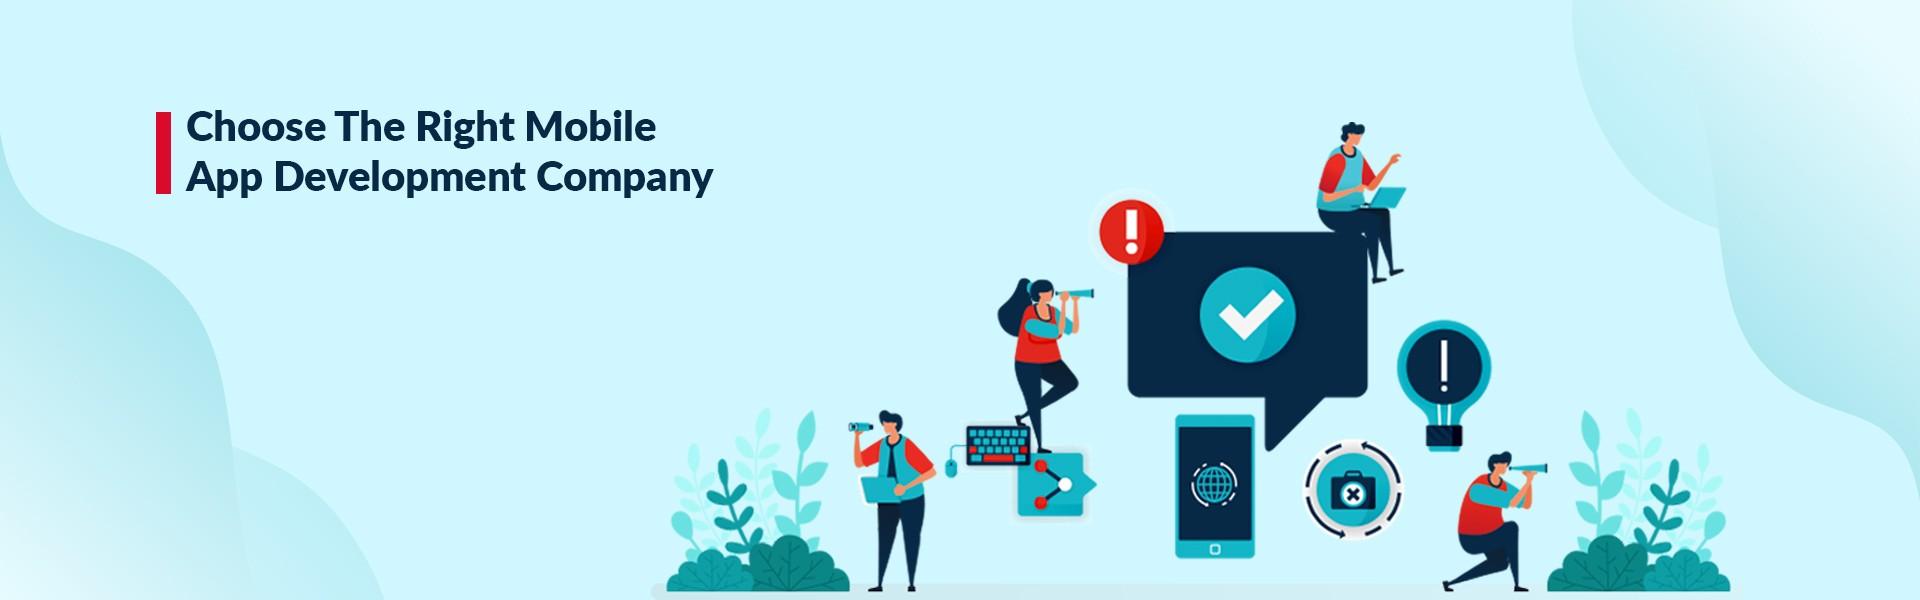 choose-the-right-mobile-app-development-Company-softsuave